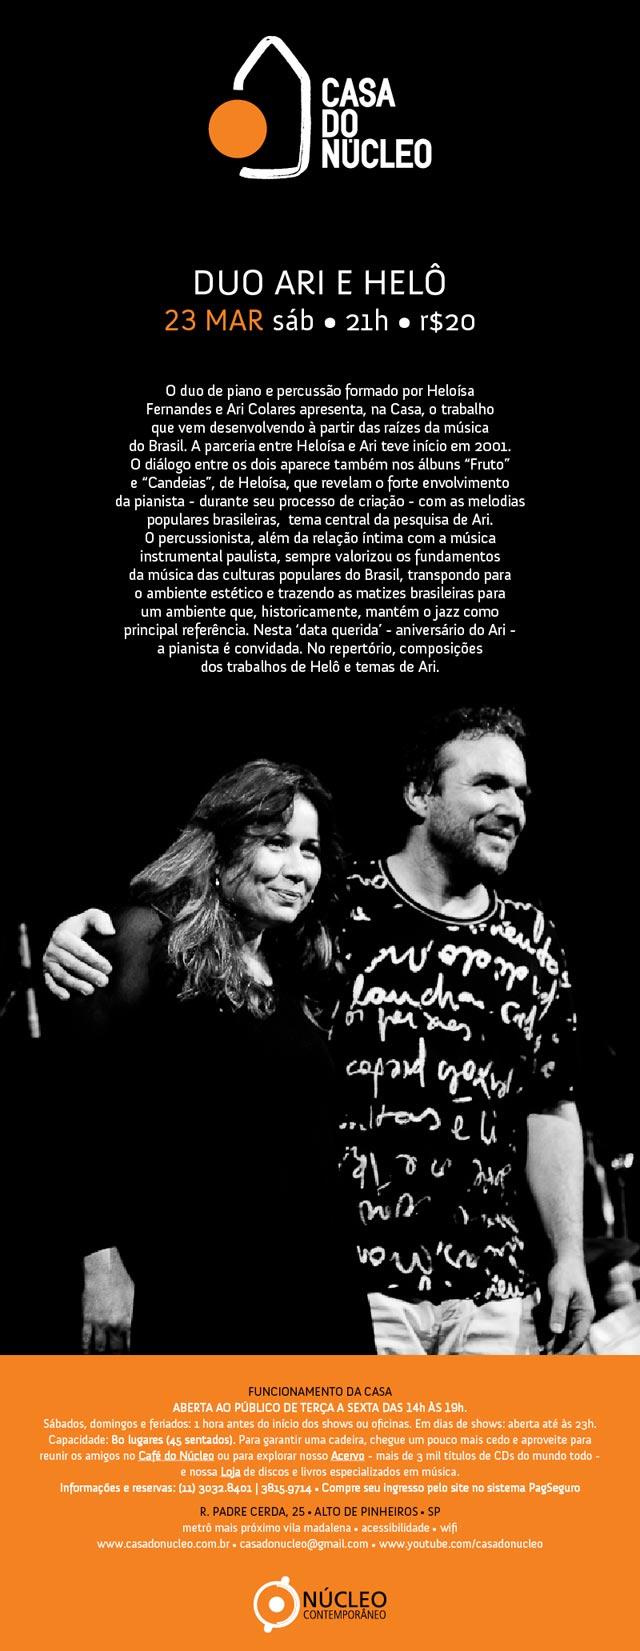 Duo Ari & Helô